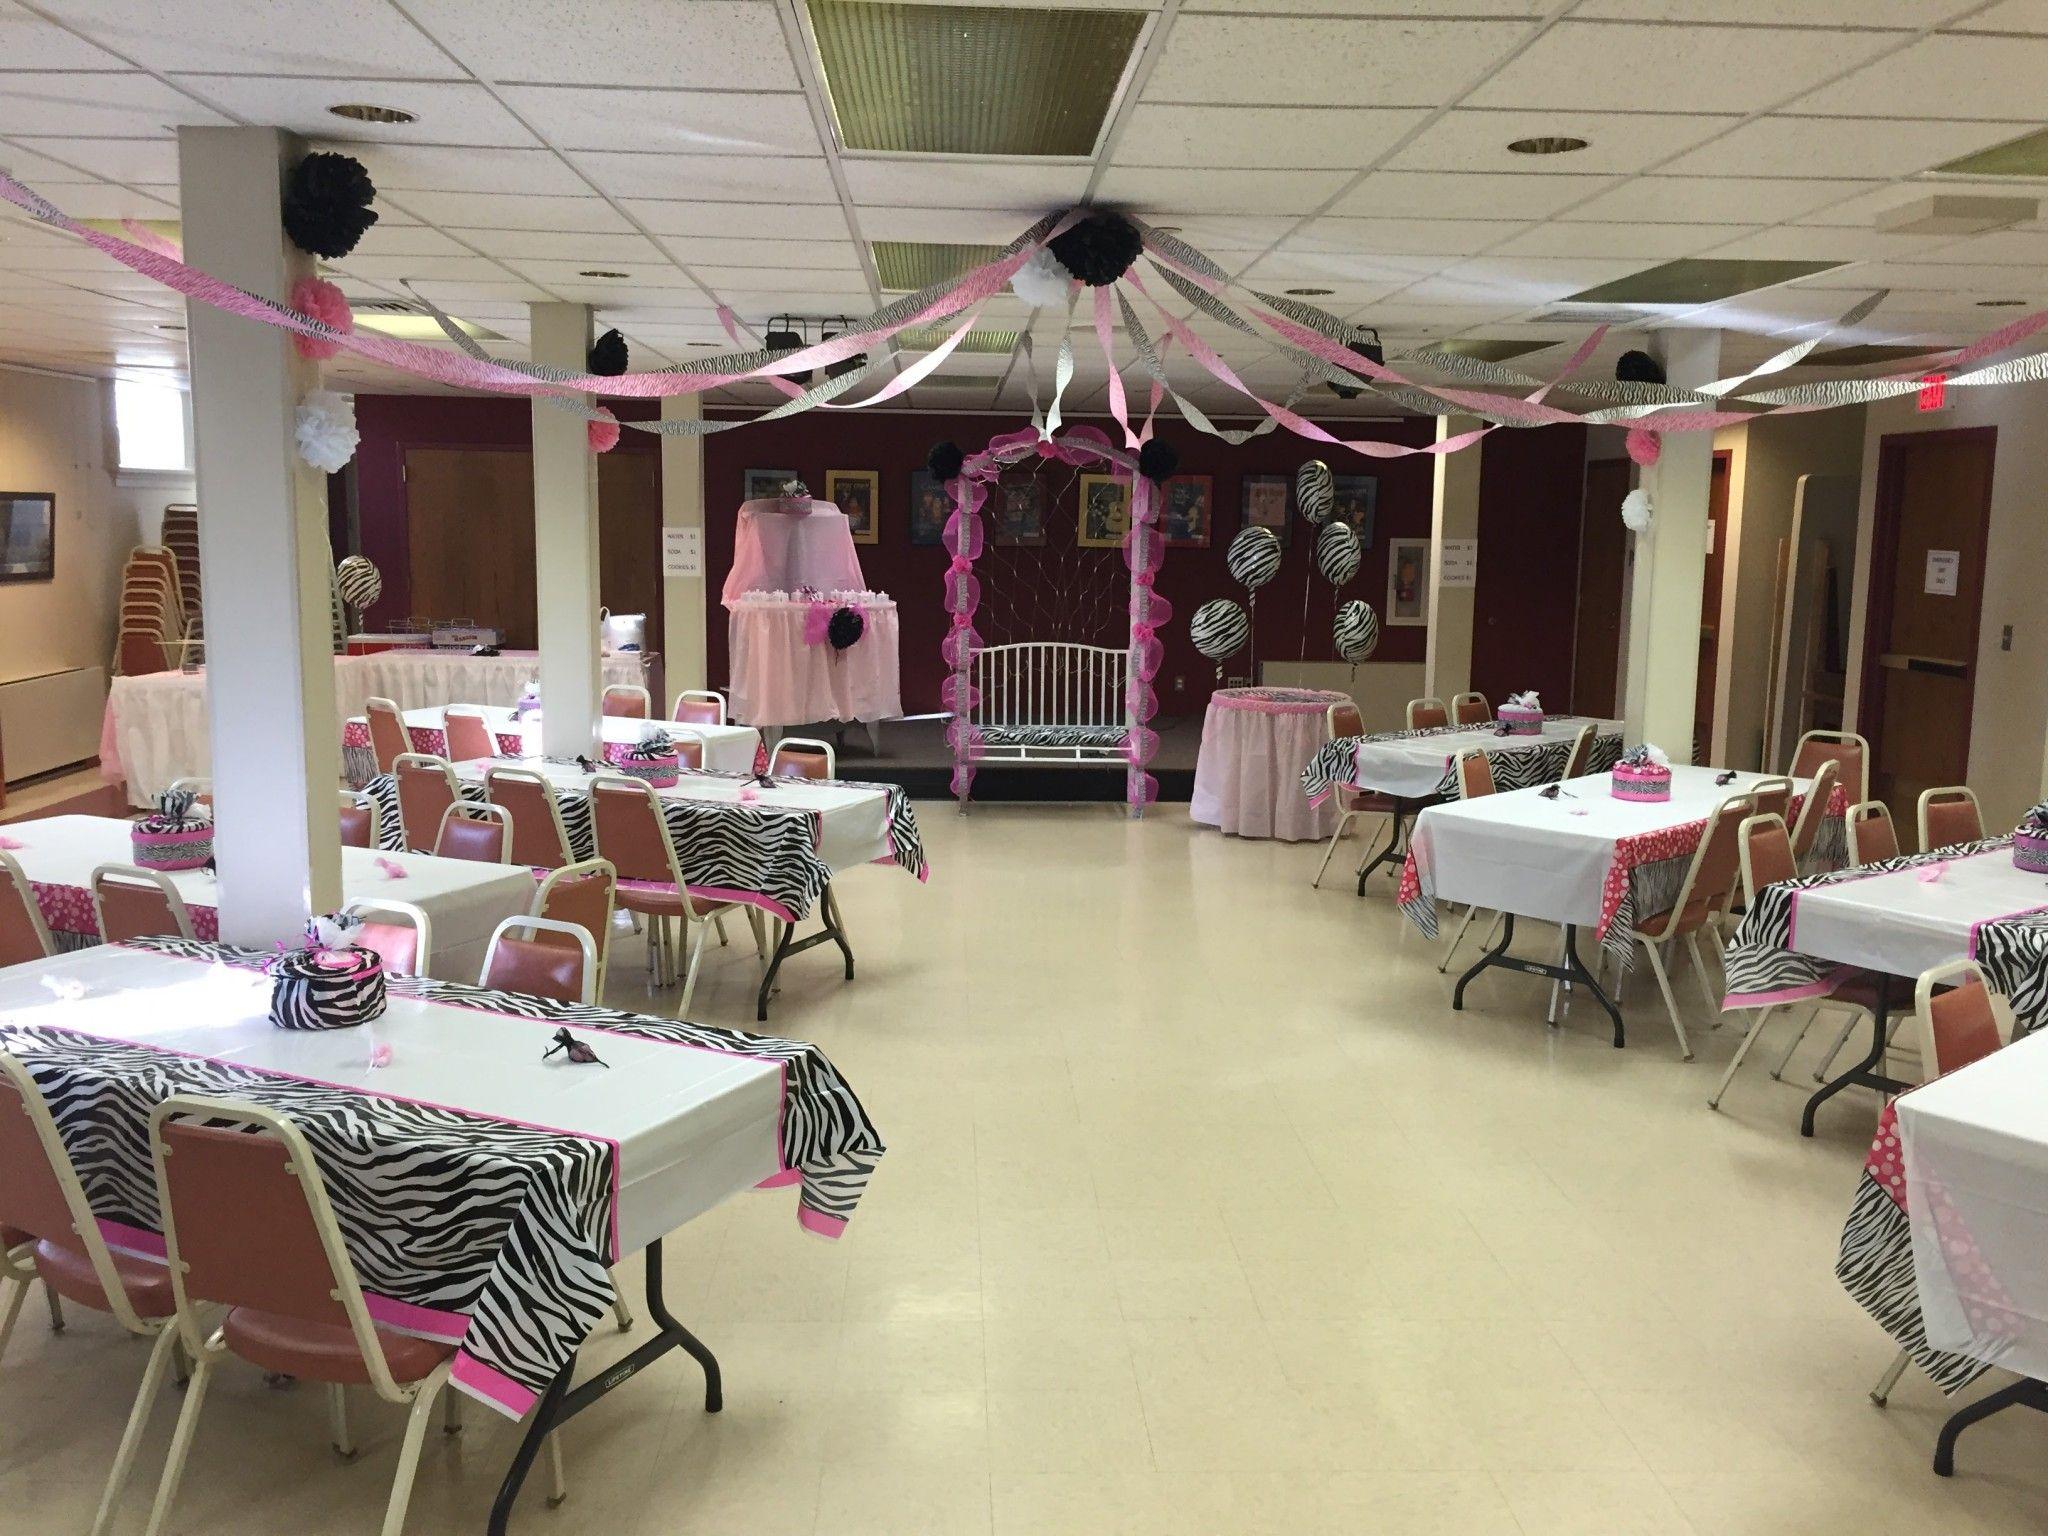 Birthday Party Halls For Rent Near Me Birthday Party Halls Party Hall Rooms For Rent